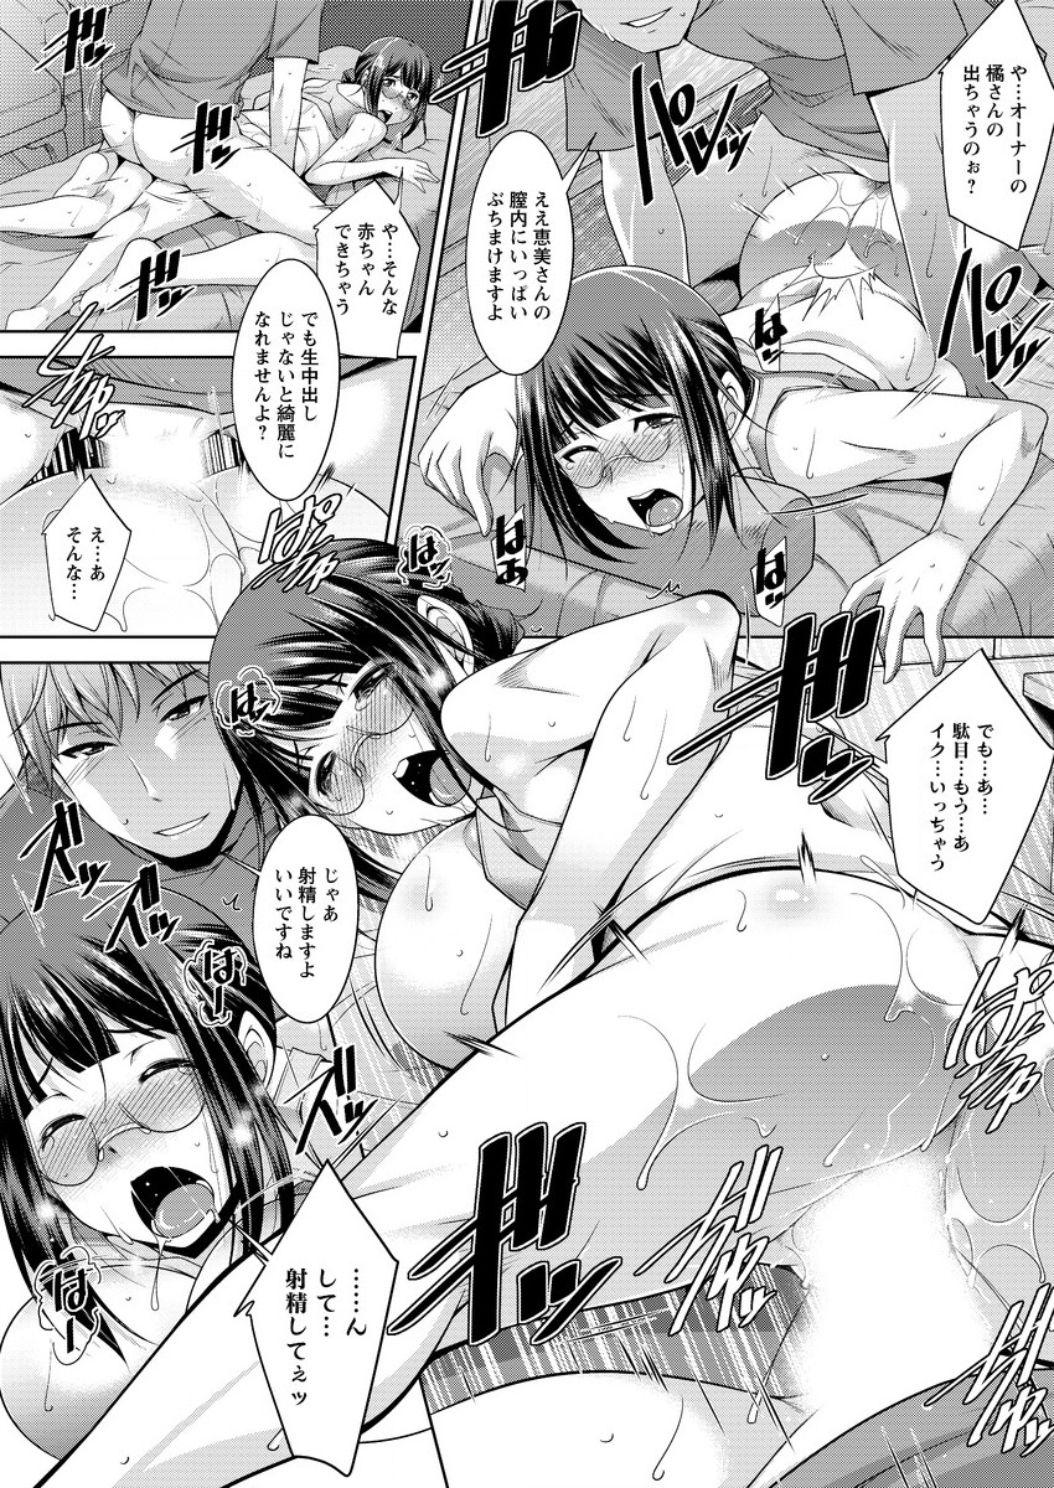 [zen9] Yacchae! Megumi-san | Do it! Megumi-san Ch 1-6 18